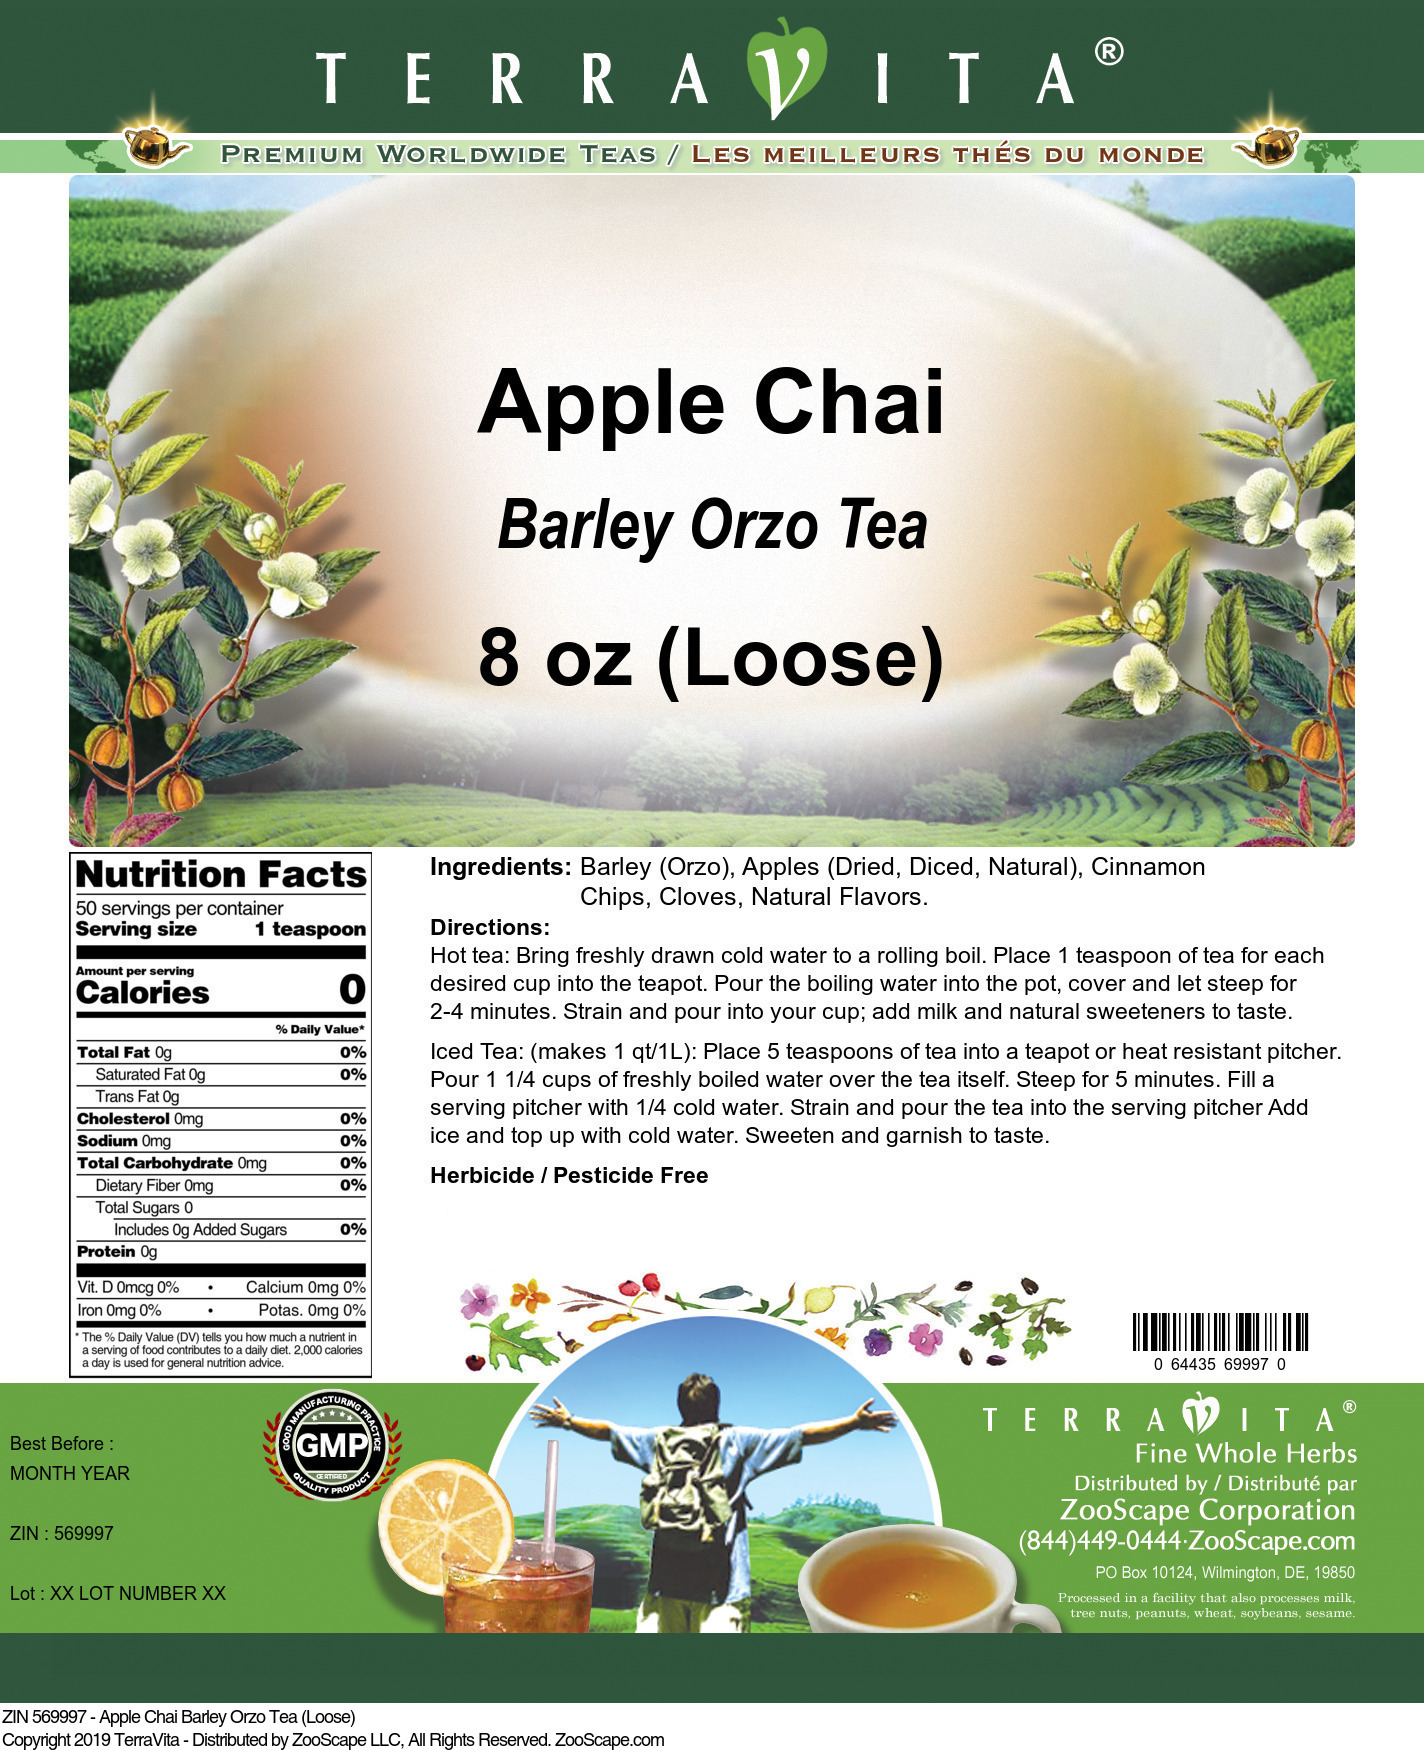 Apple Chai Barley Orzo Tea (Loose)